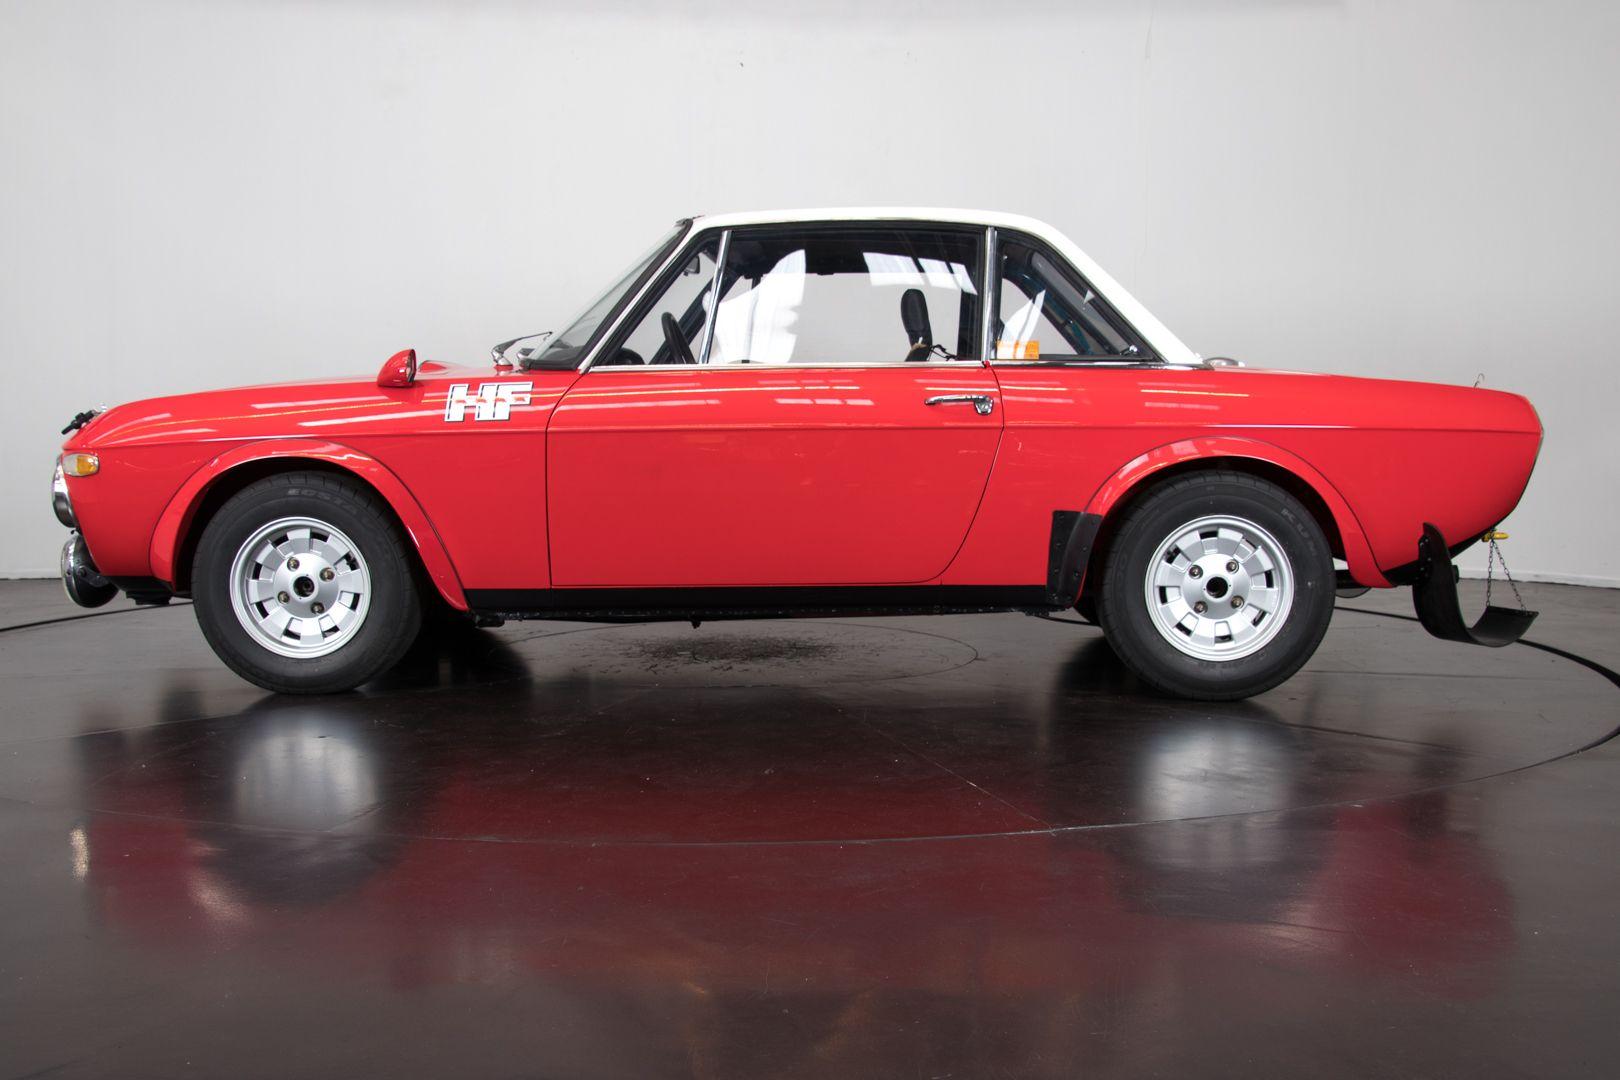 1970 Lancia Fulvia HF 1.6 - Gruppo 4 18807